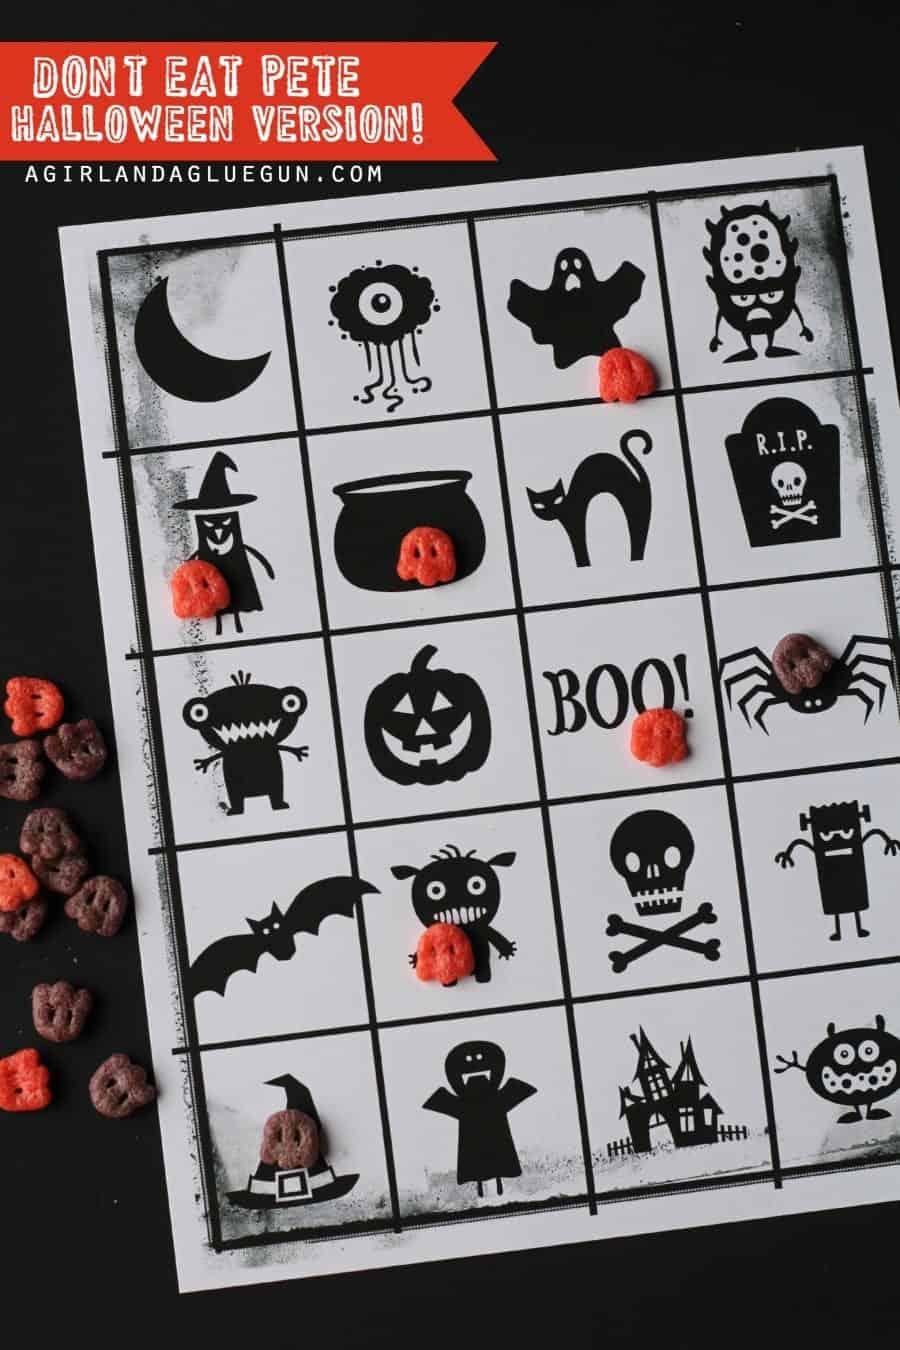 don't eat pete Halloween game free printable